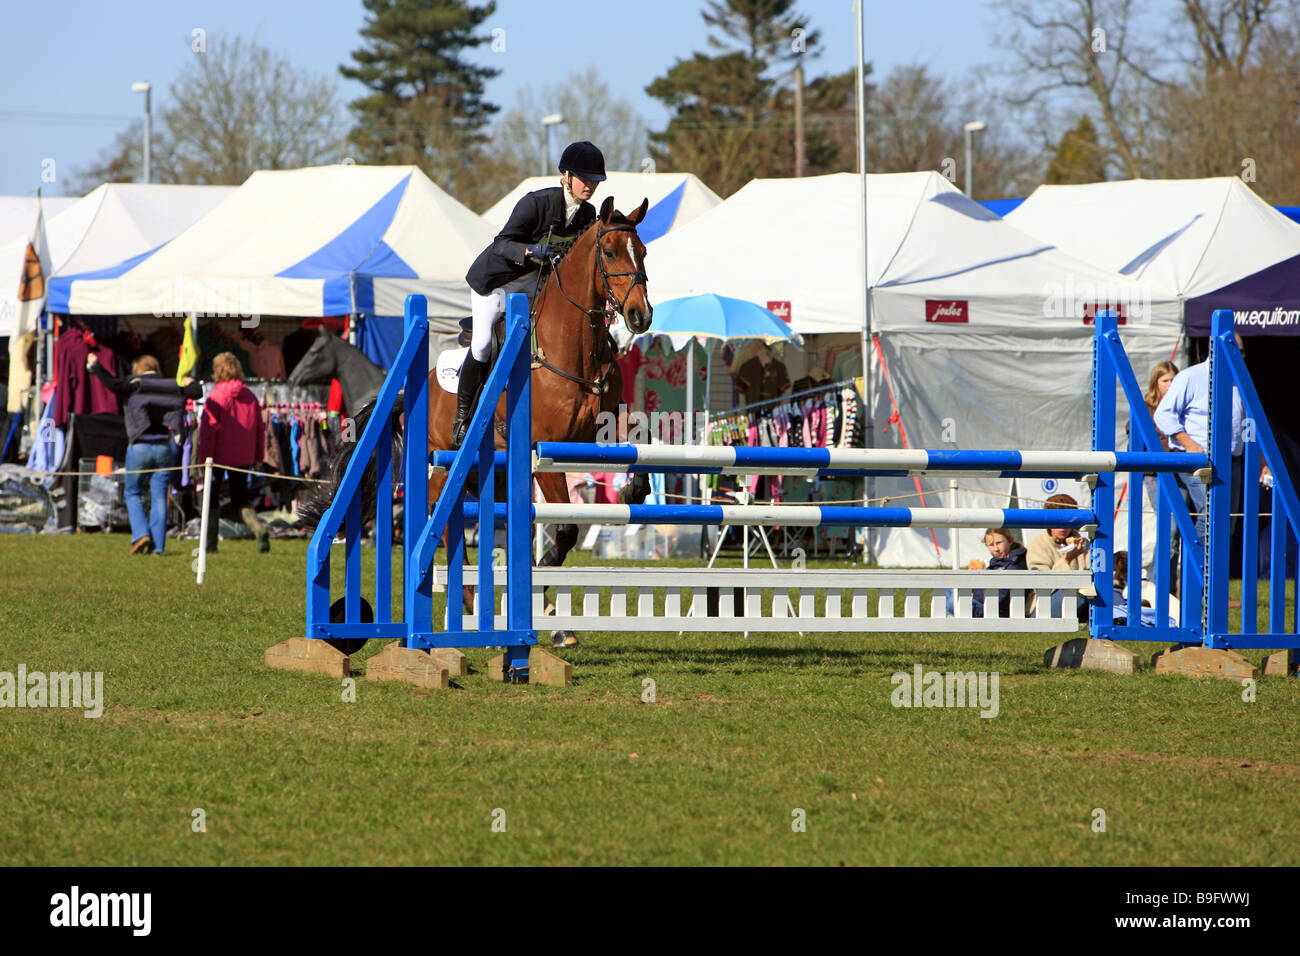 Jinete femenino en un Horse Show Jumping evento en Inglaterra rural Foto de stock